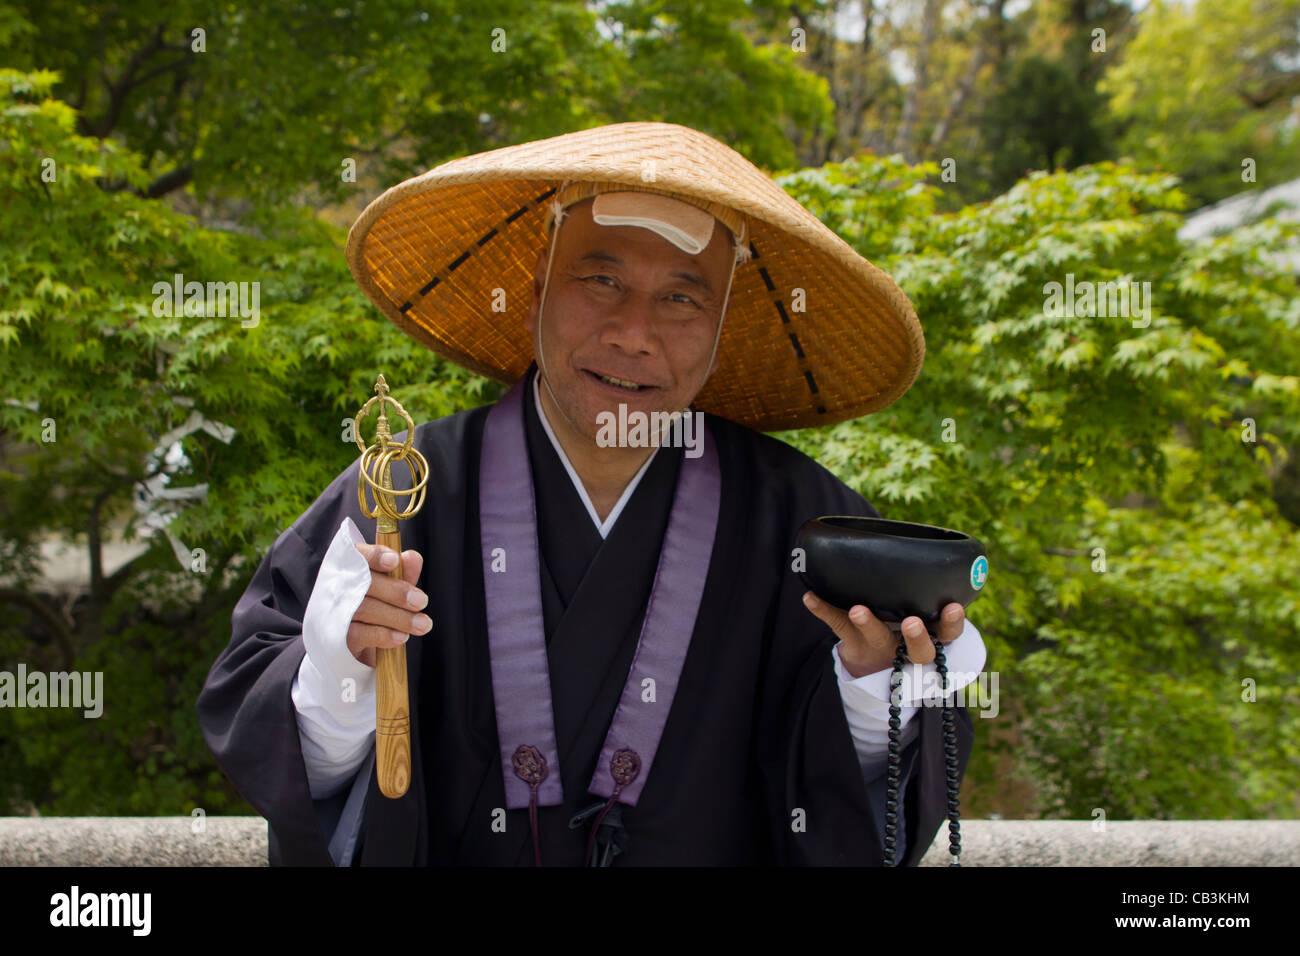 A shinto monk collecting money outside Ise grand shrine, Ise, Honshu, Japan, Asia. - Stock Image